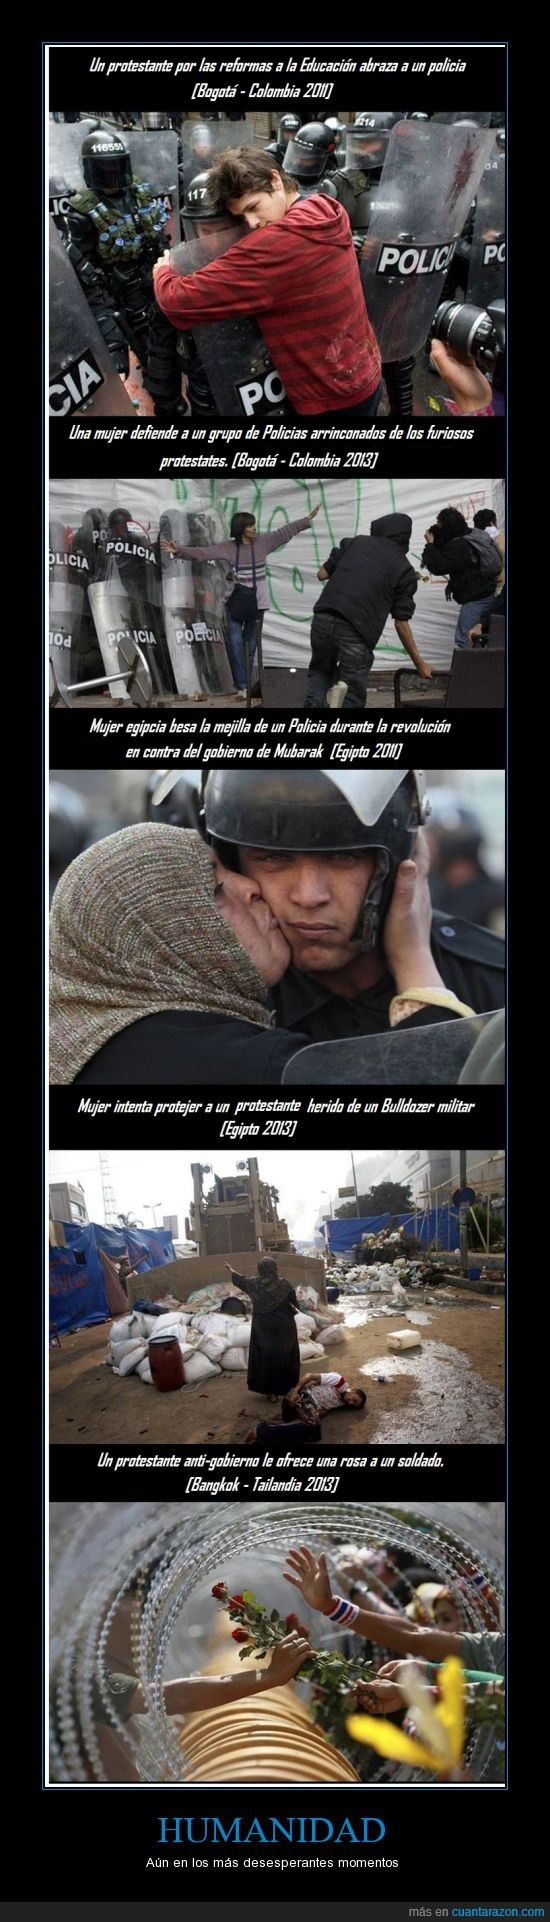 ayudar,humanidad,manifestante,paz,policia,protesta,rosa,salvar